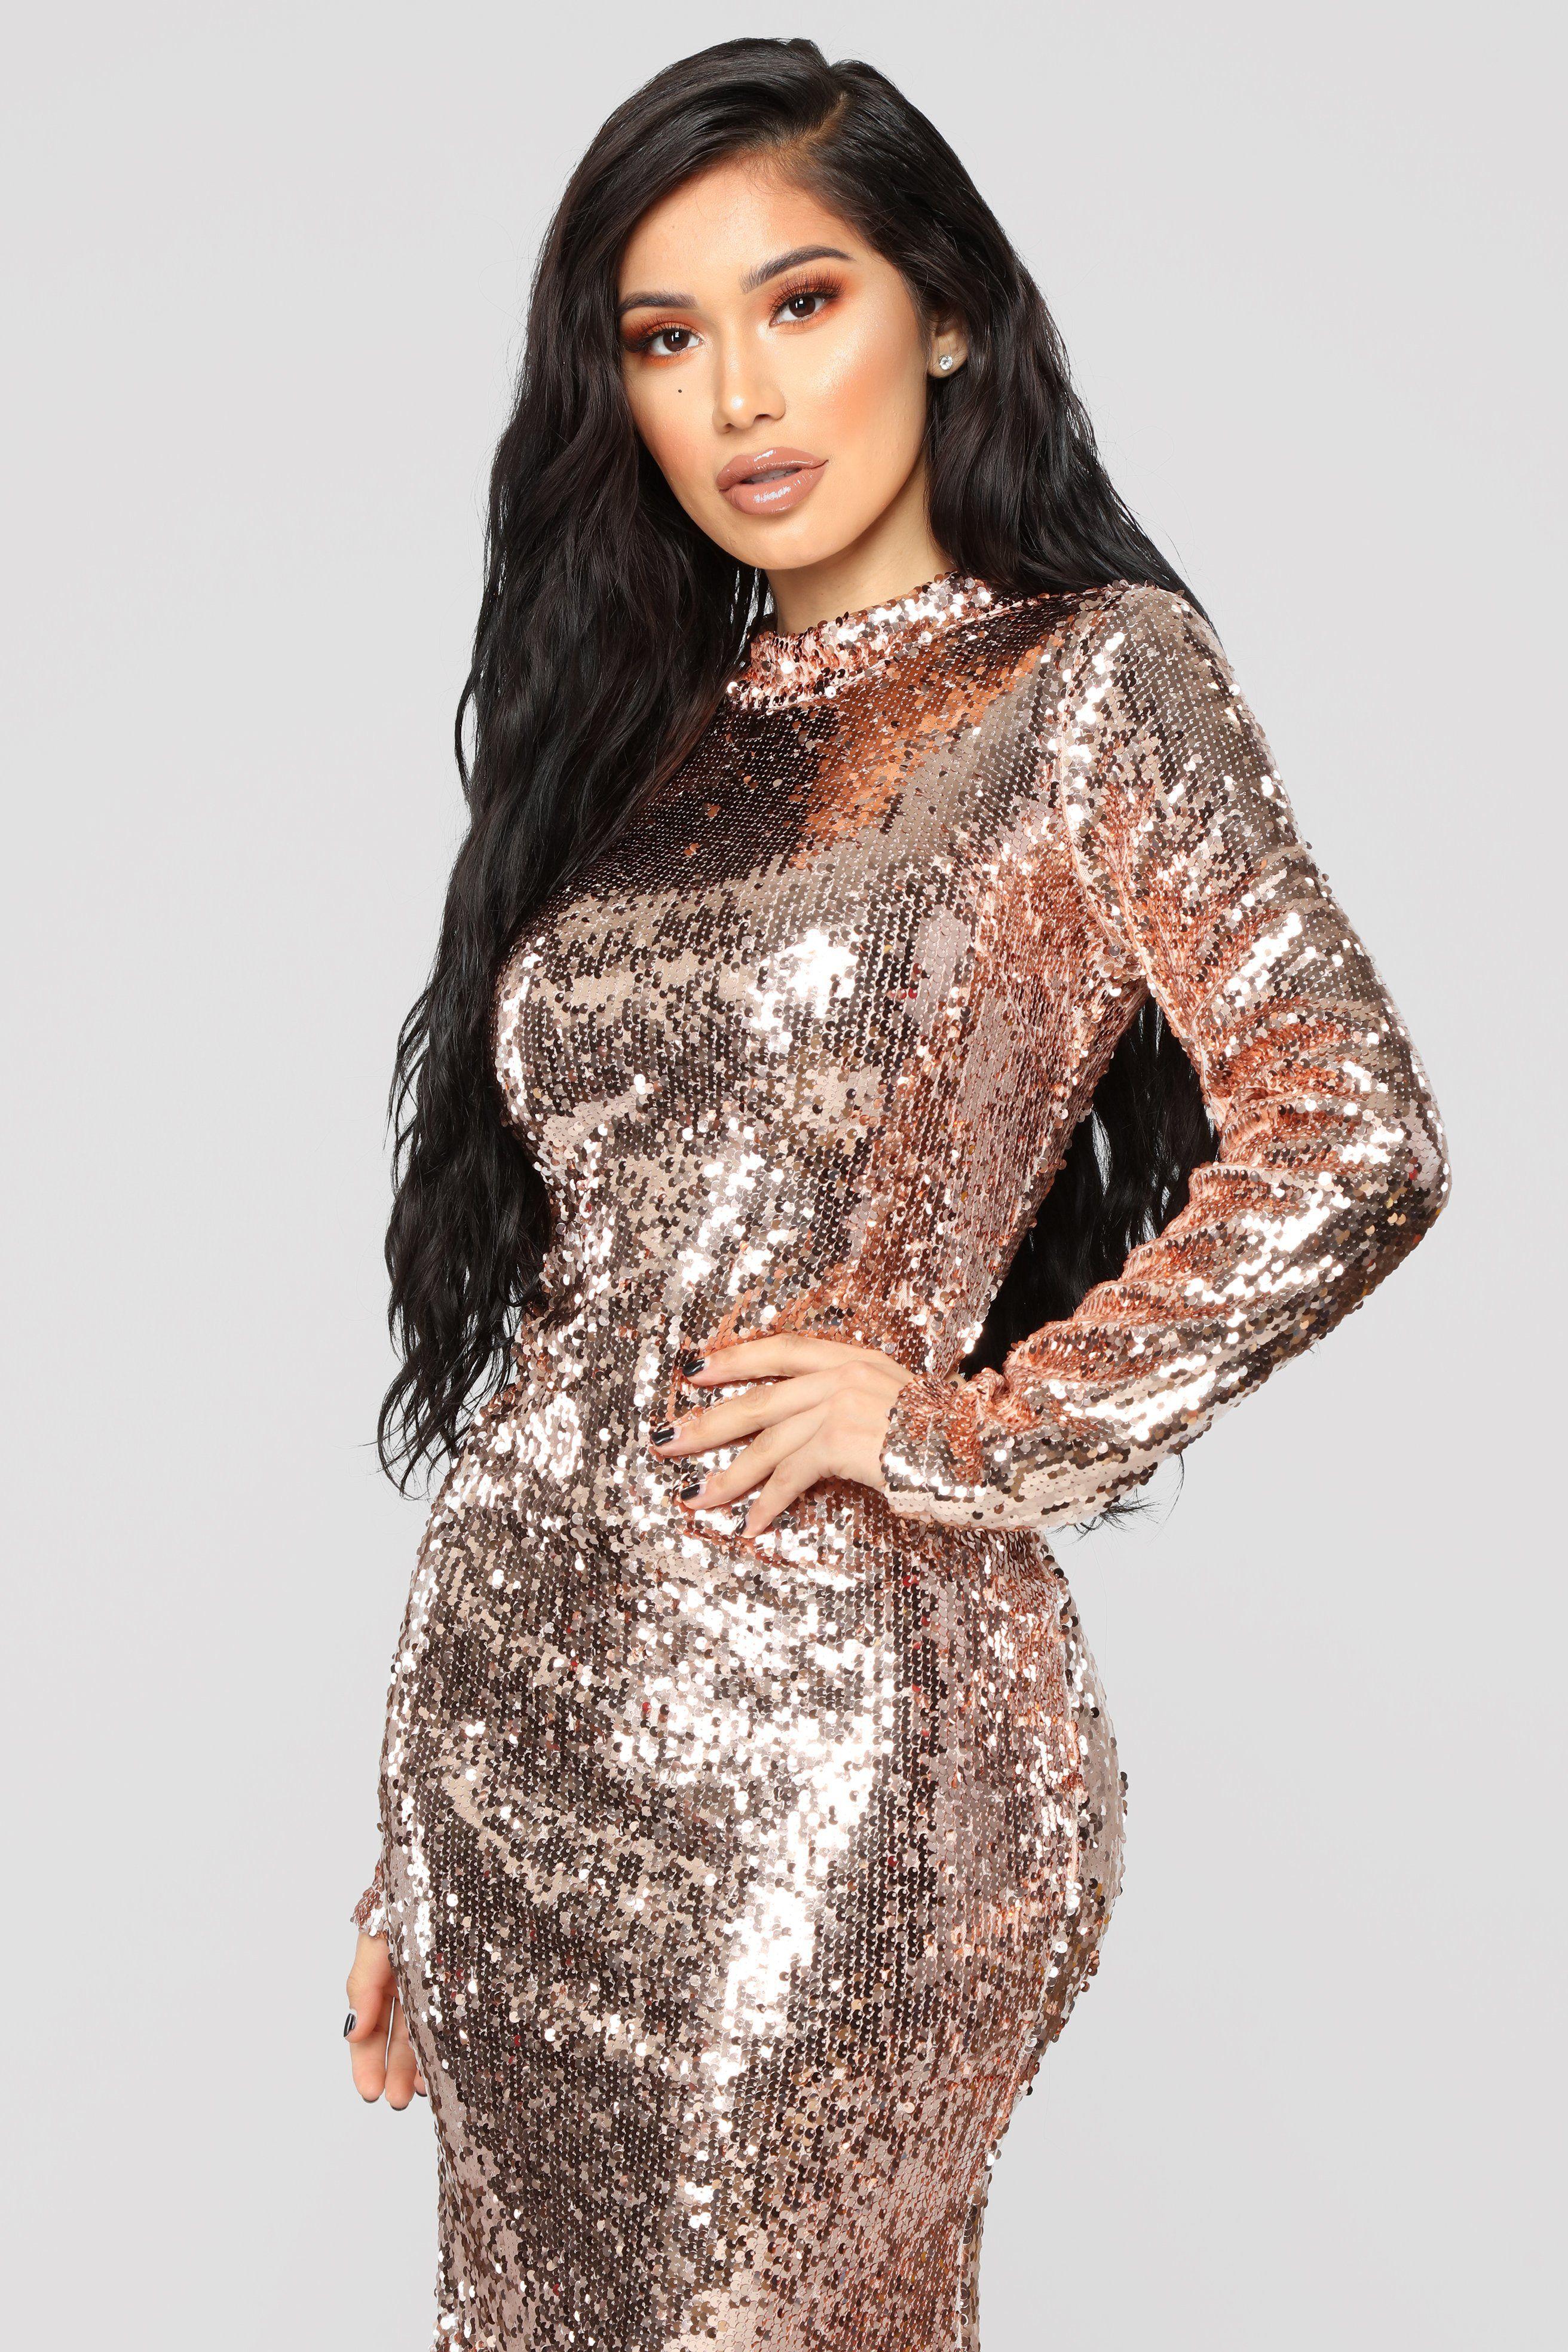 Practically Famous Sequin Dress Rose Gold Sparkle Dress Dresses Shiny Dresses